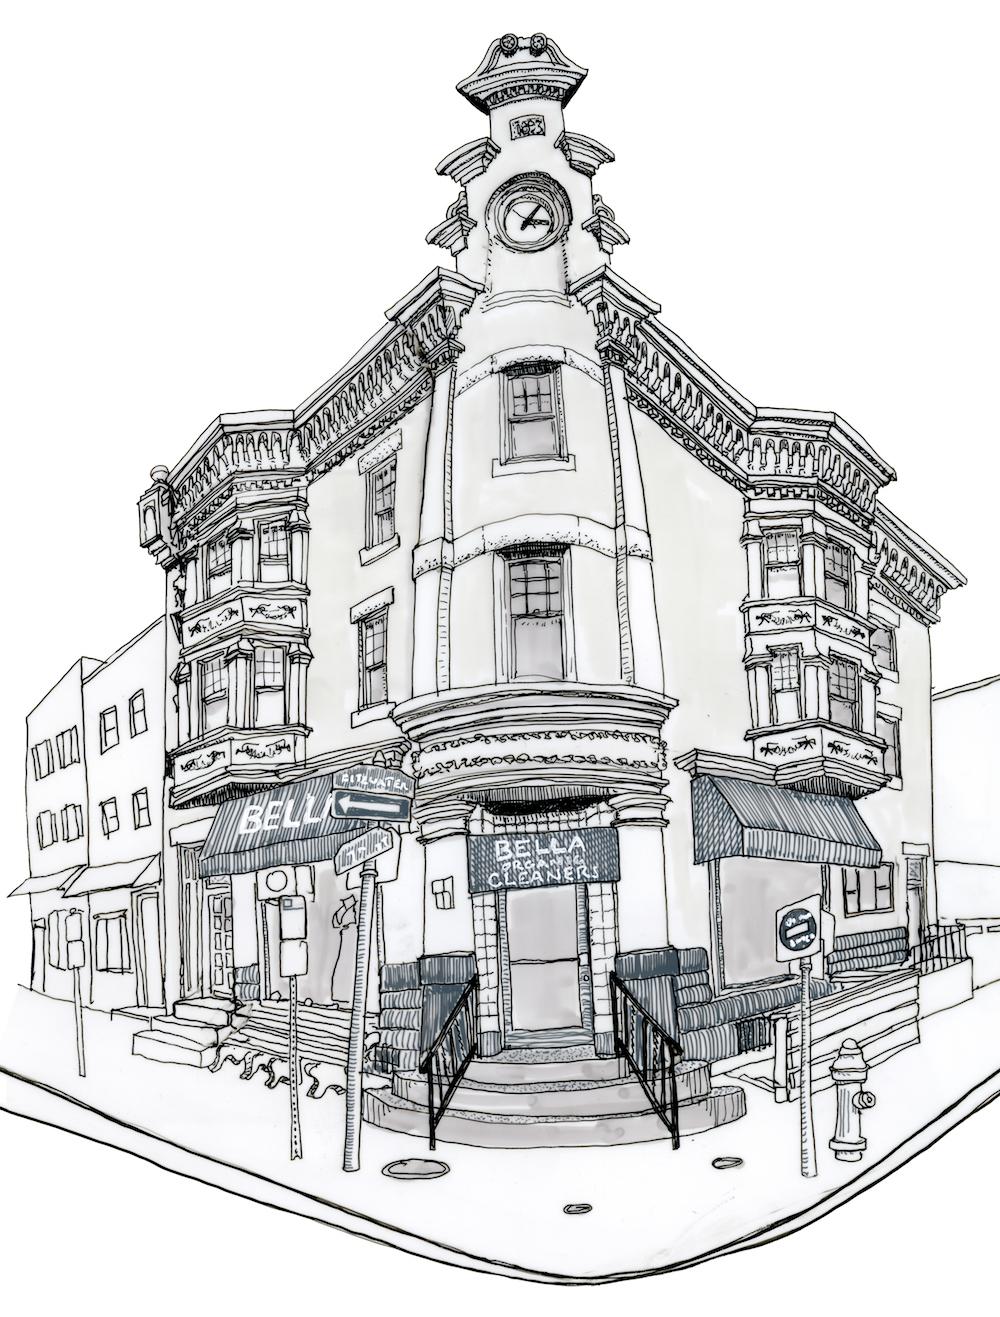 Unlisted Philadelphia: Banca Bozzelli